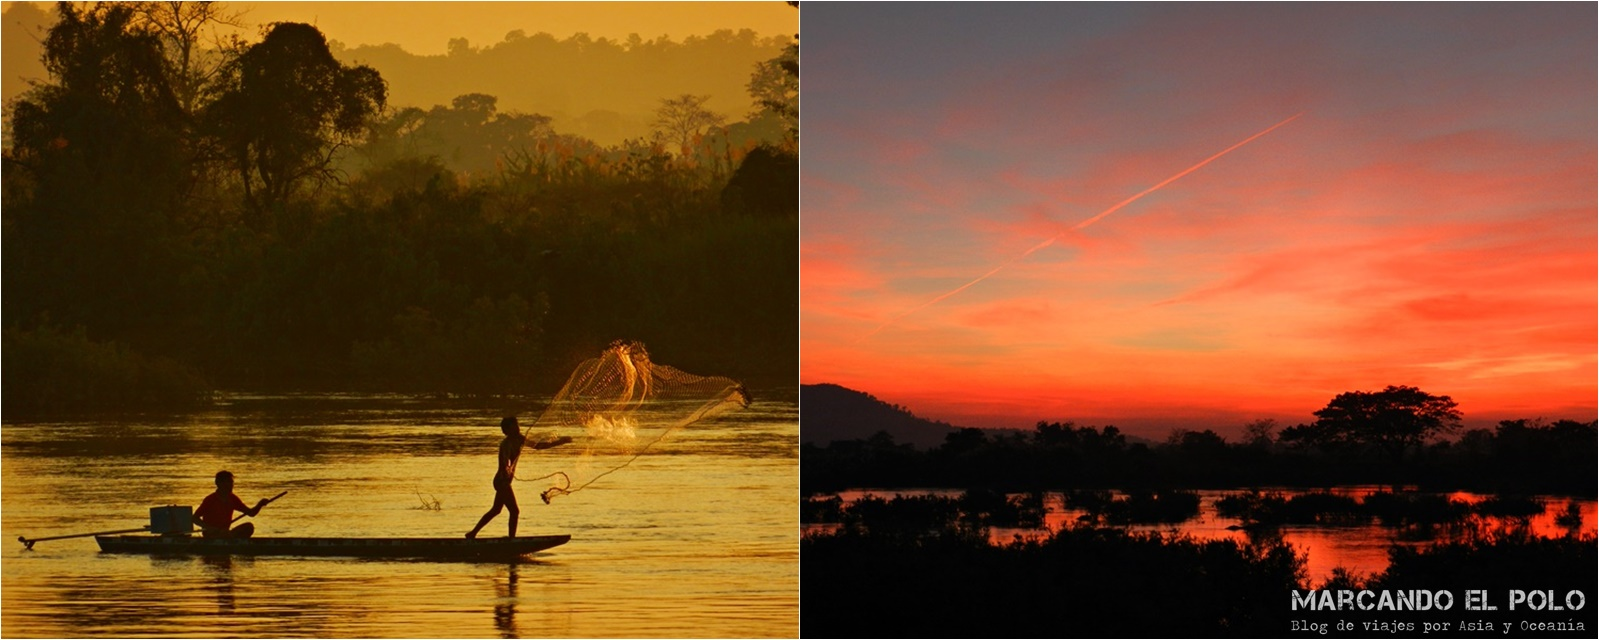 Viajar a Laos: Atardeceres mágicos en Don Det.